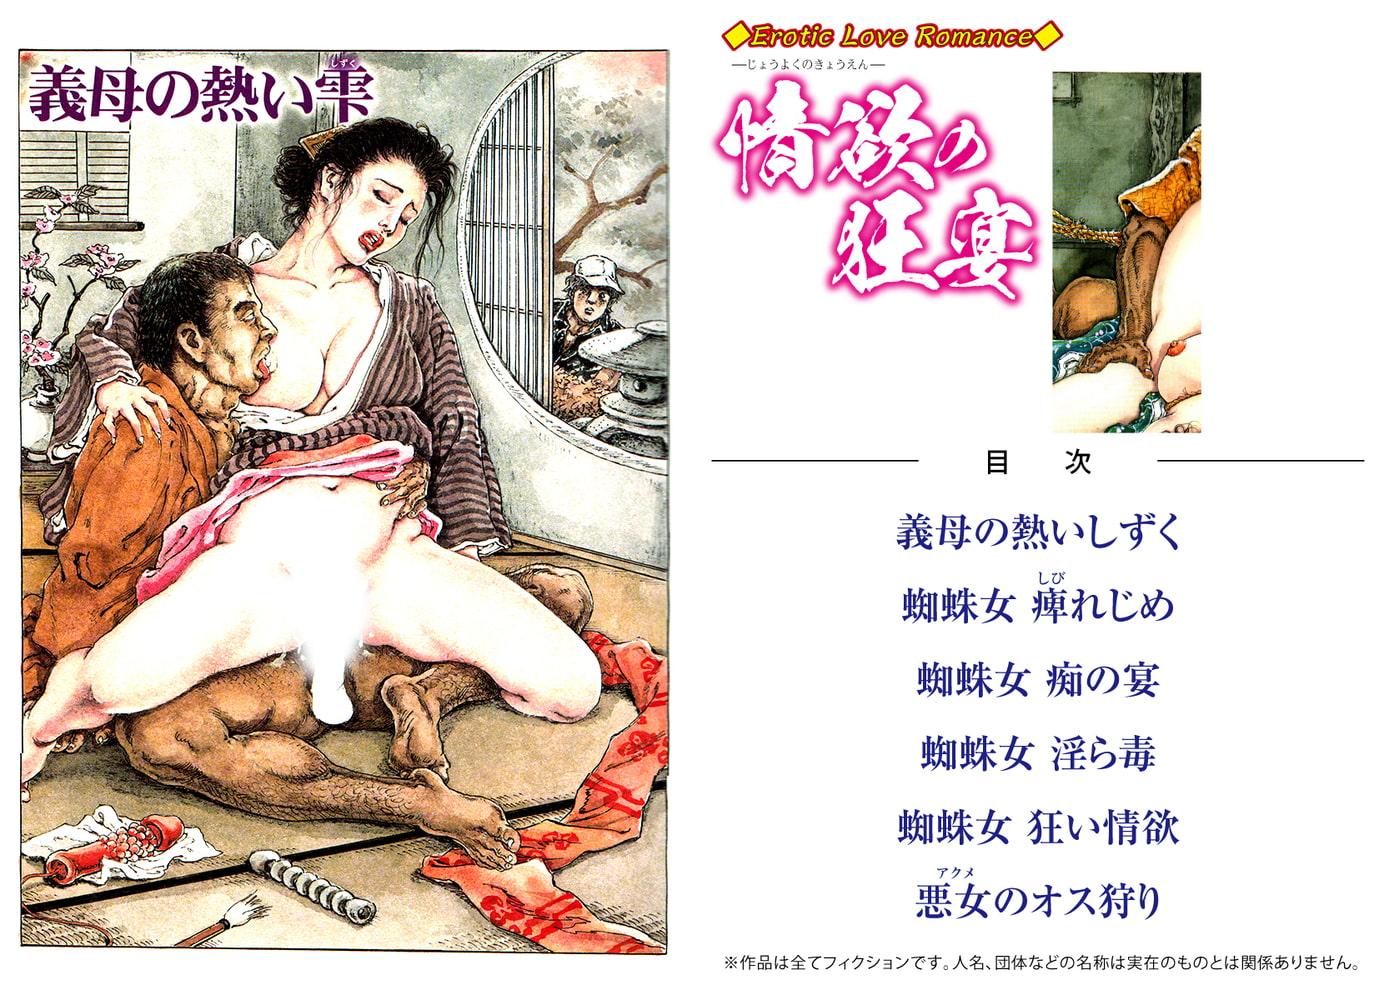 Erotic Love Romance 情欲の狂宴